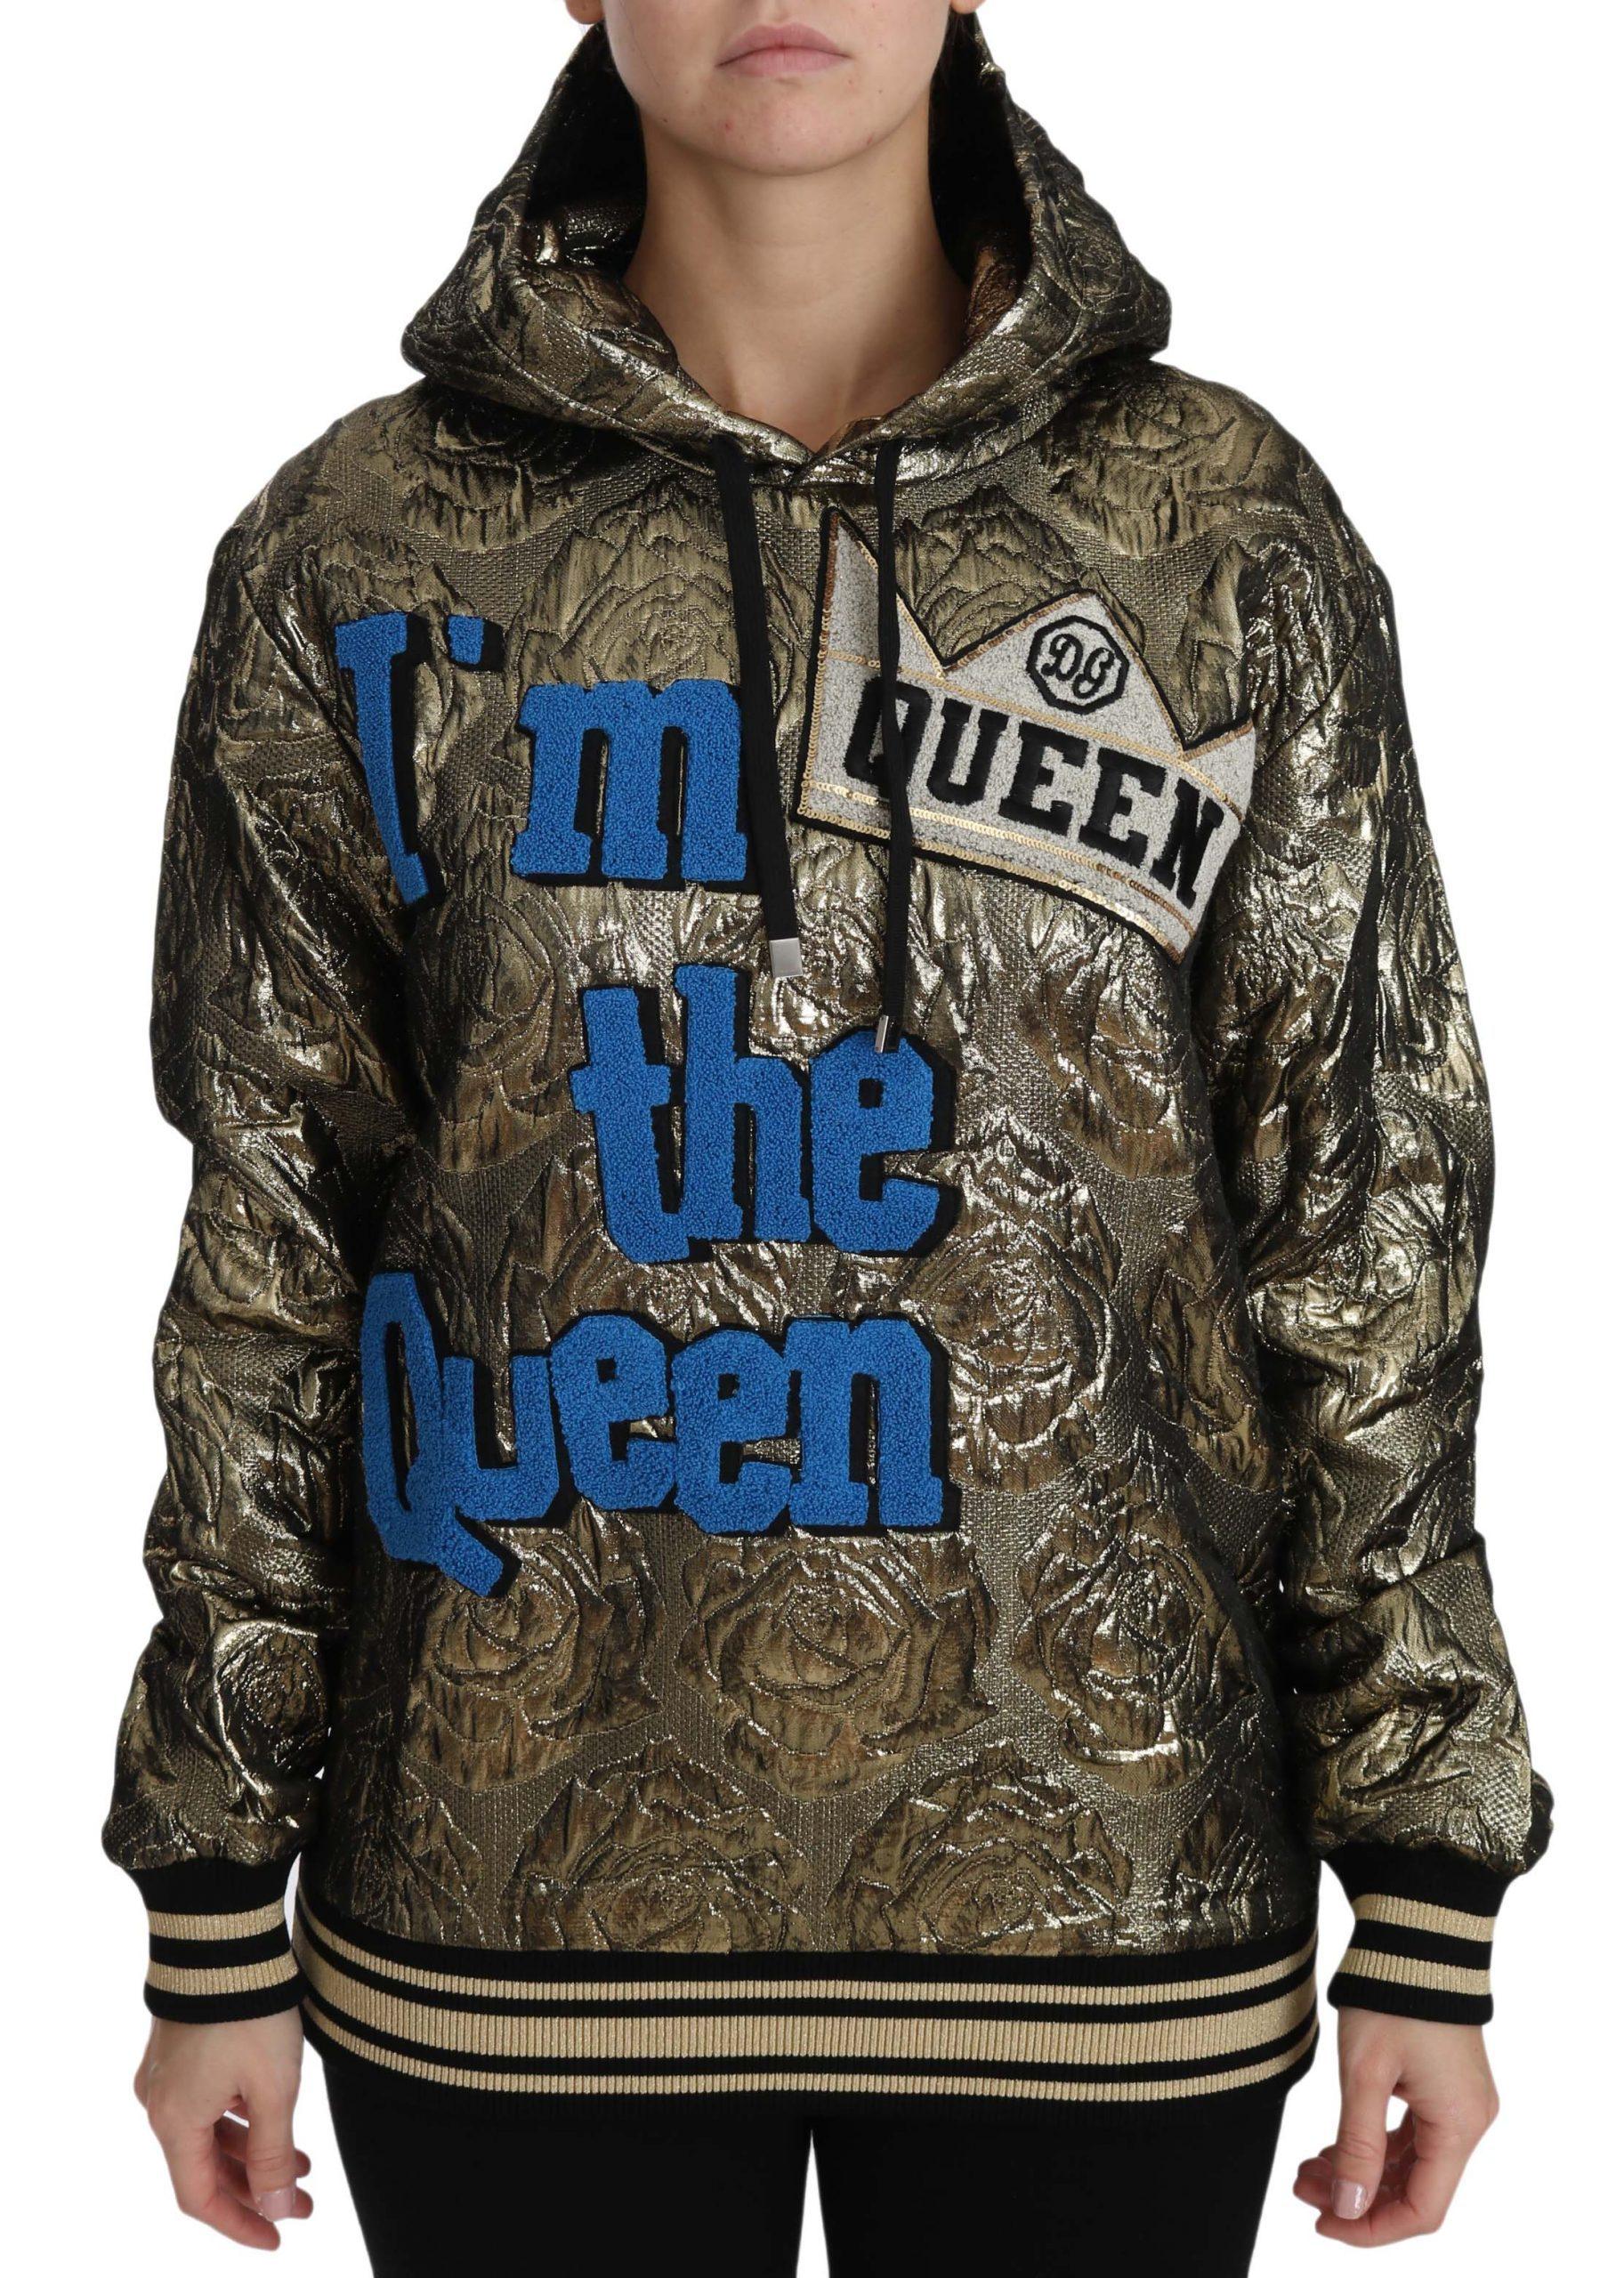 Dolce & Gabbana Women's Im The Queen Jaquard Gold Sweatshirt Multicolor TSH3182 - IT38|XS